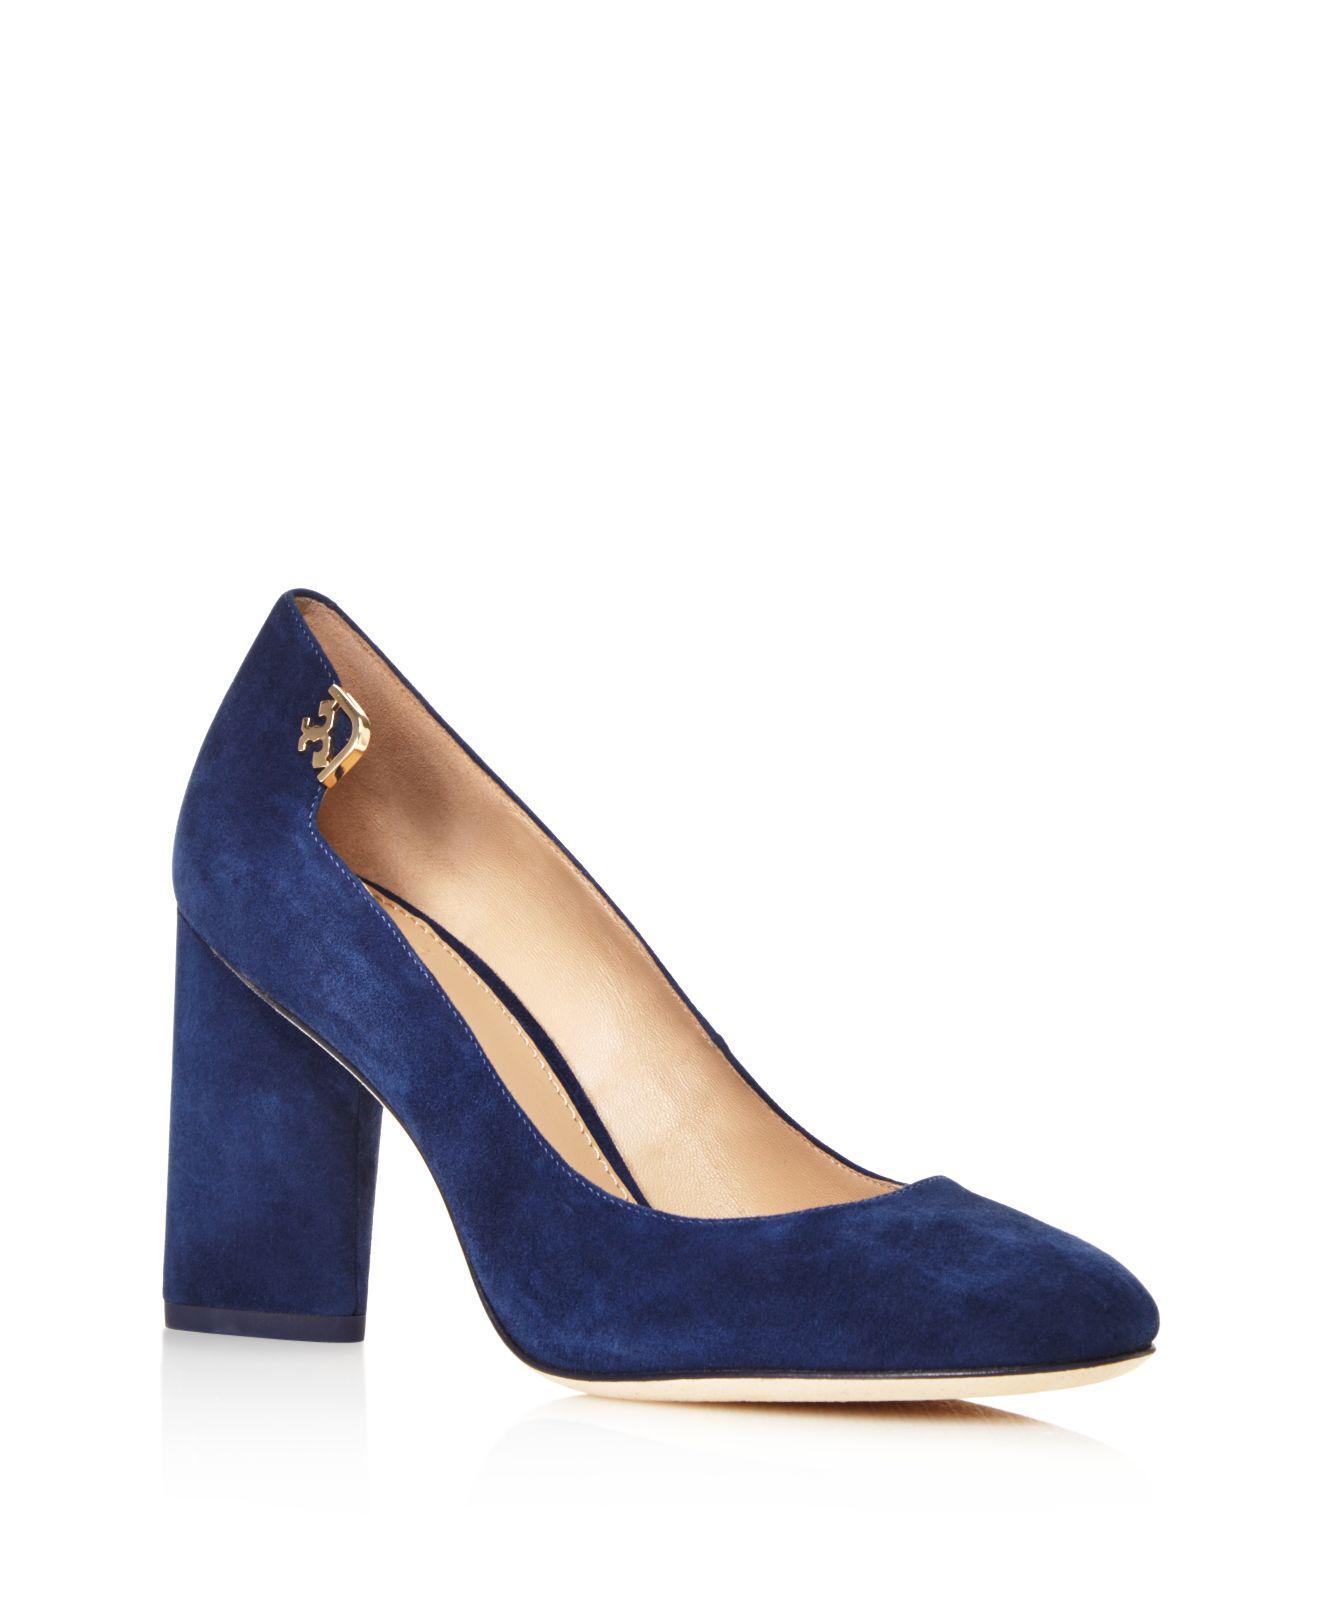 Lux London >> Lyst - Tory Burch Elizabeth Suede High Block Heel Pumps in Blue